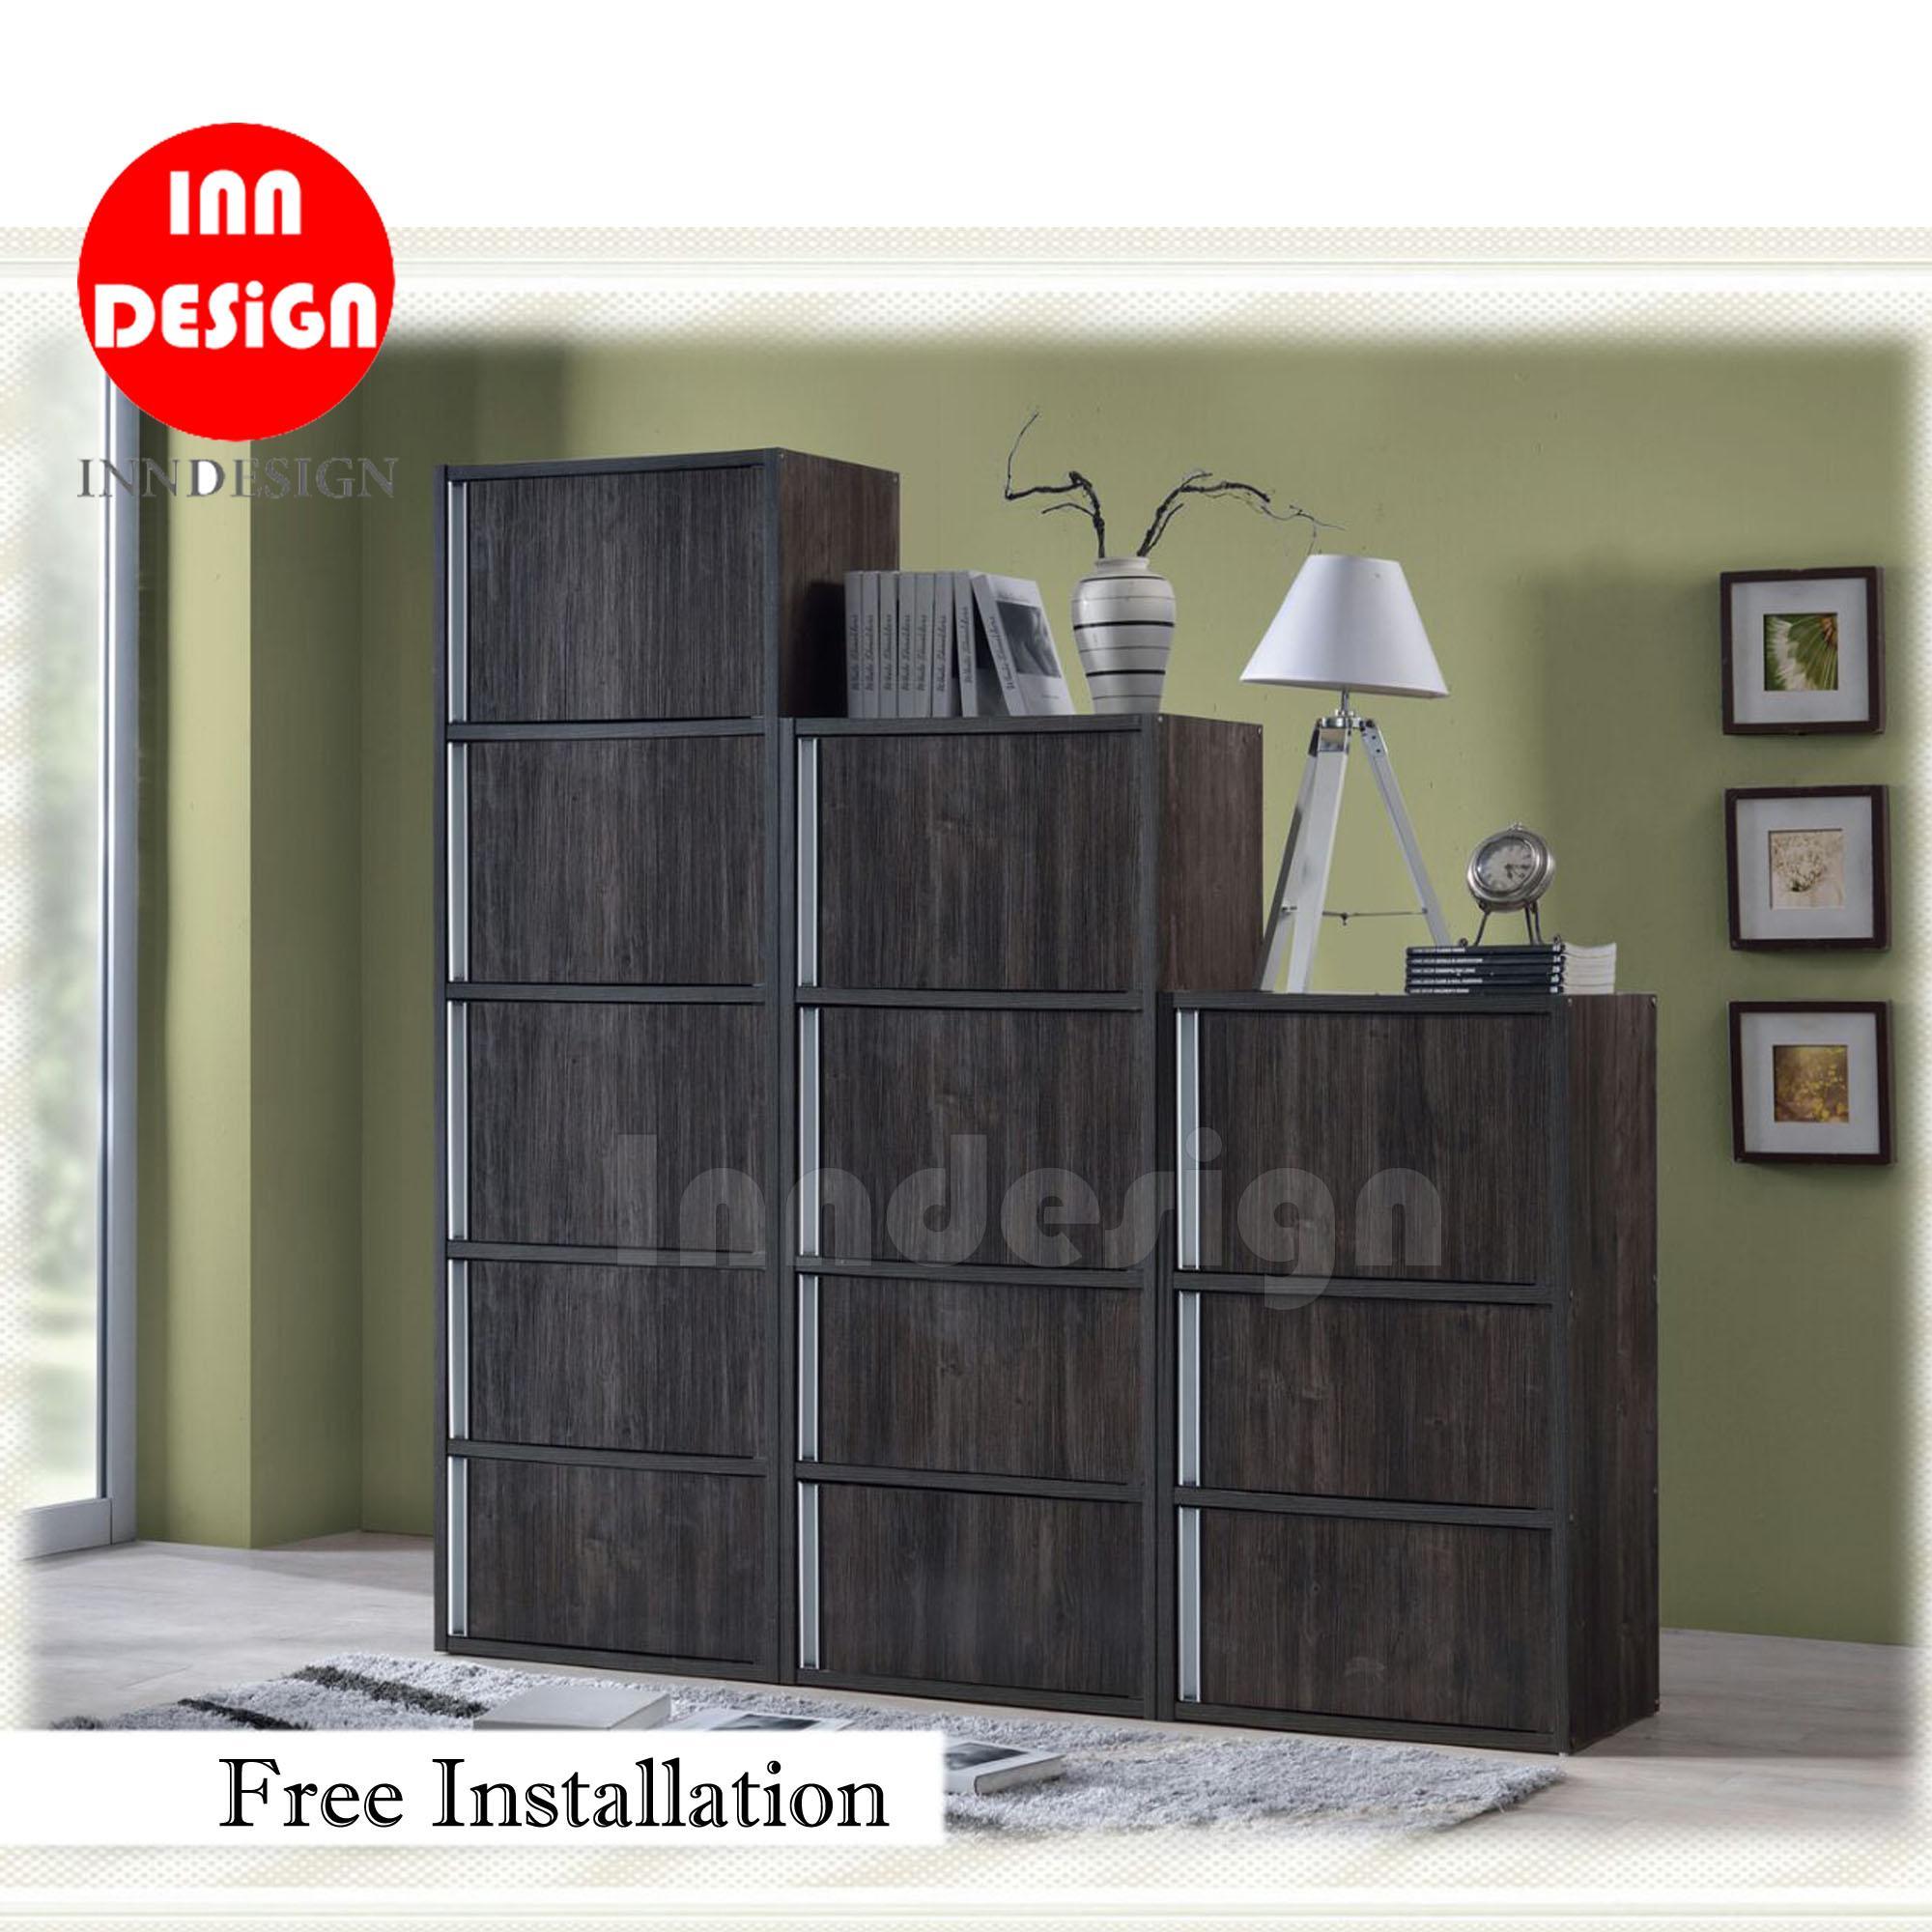 Chirtena Cabinet / Utility Cabinet / Bookshelf / Bookcase (Dark Oak) - Free Installation